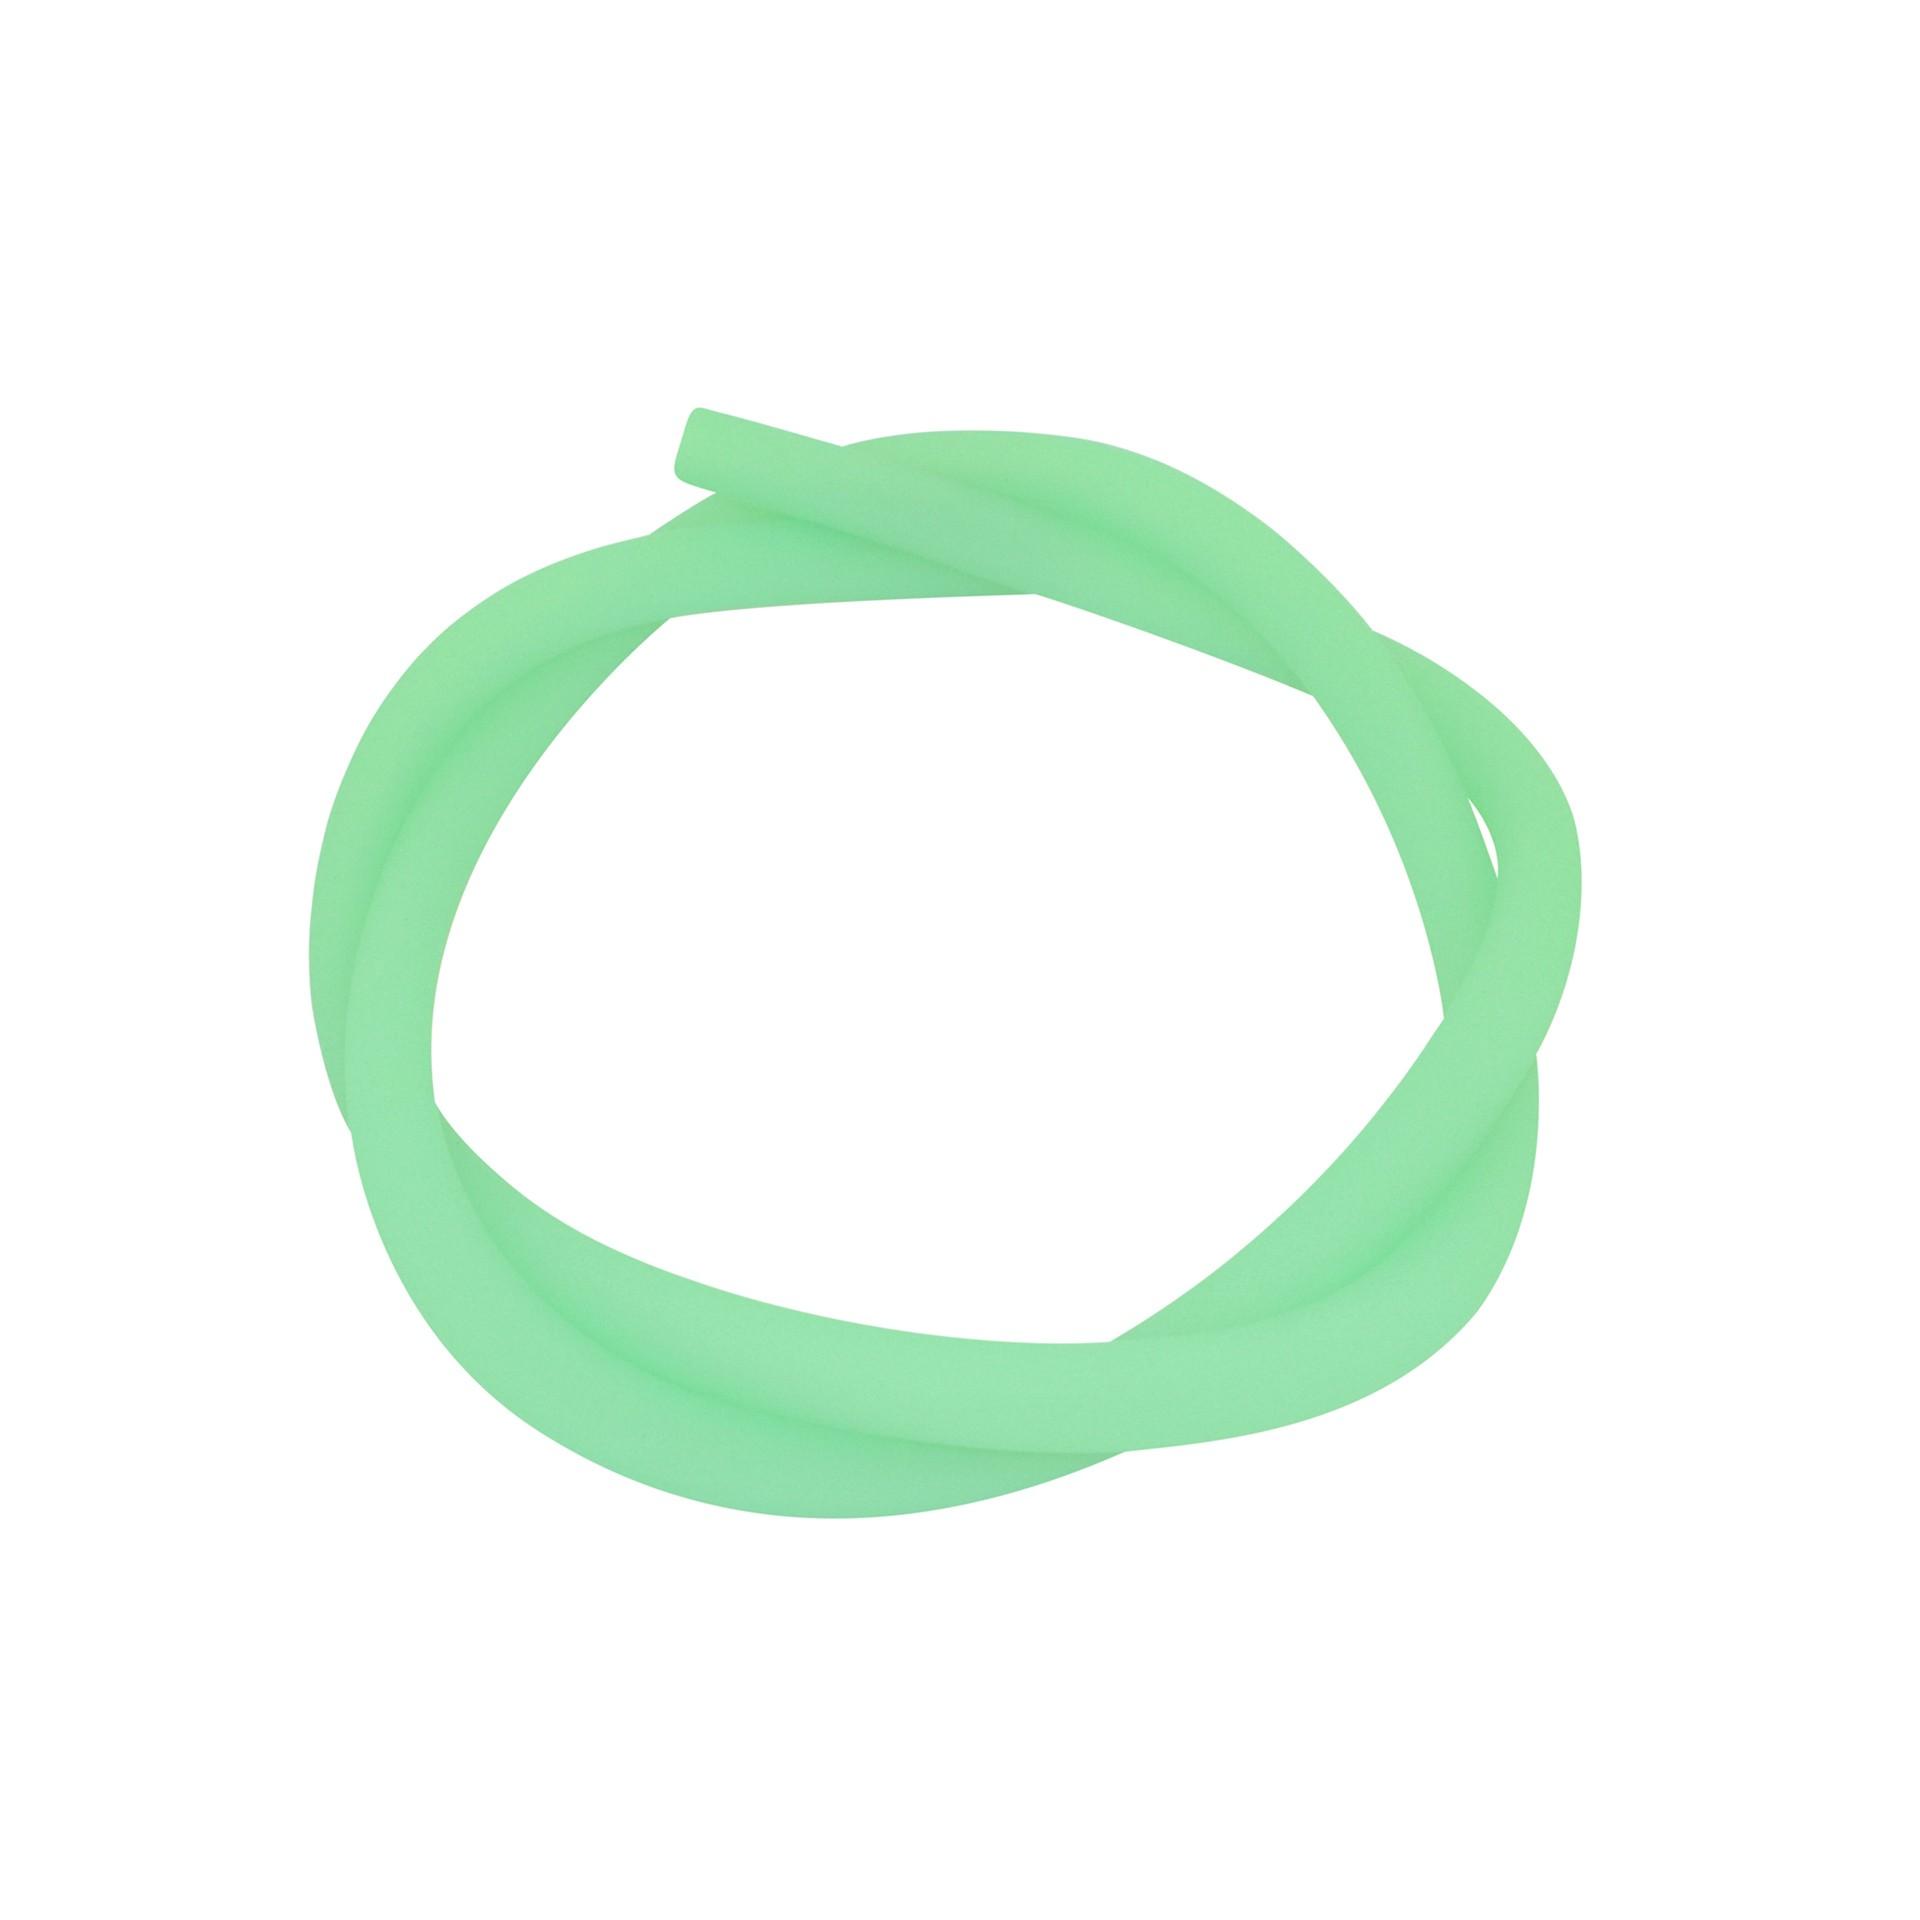 Paname Silikonschlauch - grün glow